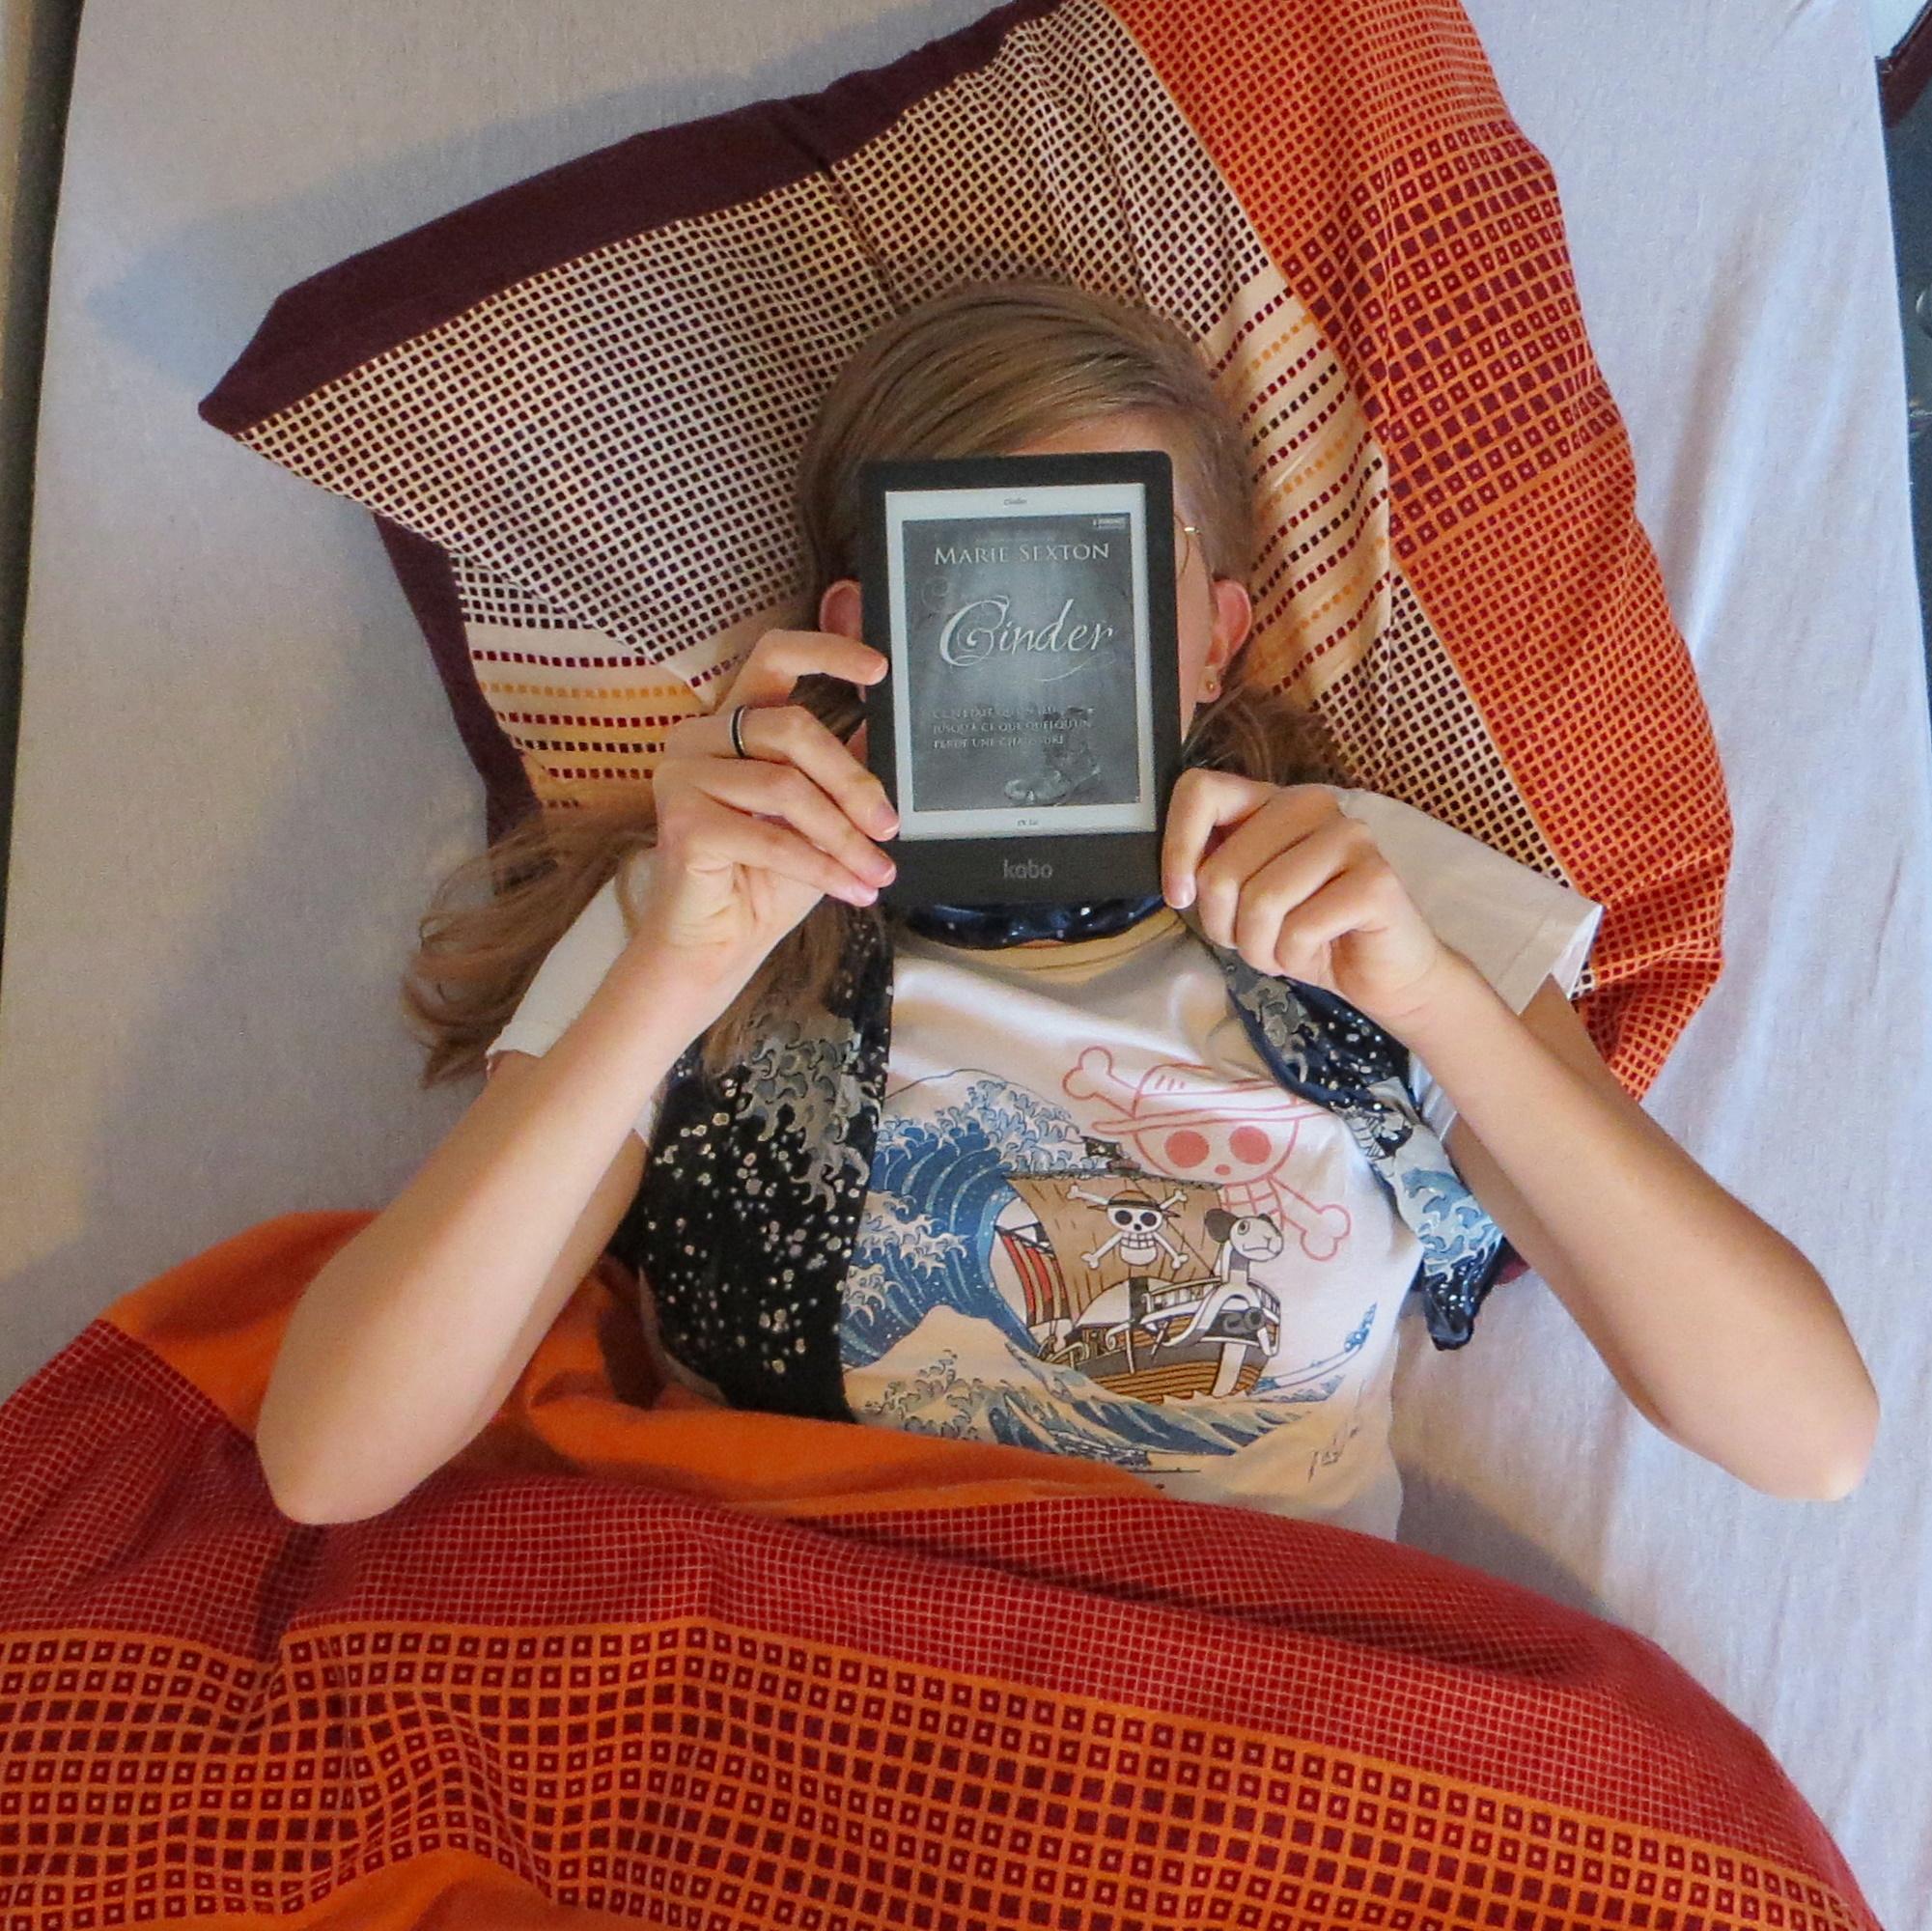 femme lisant Cinder dans son lit